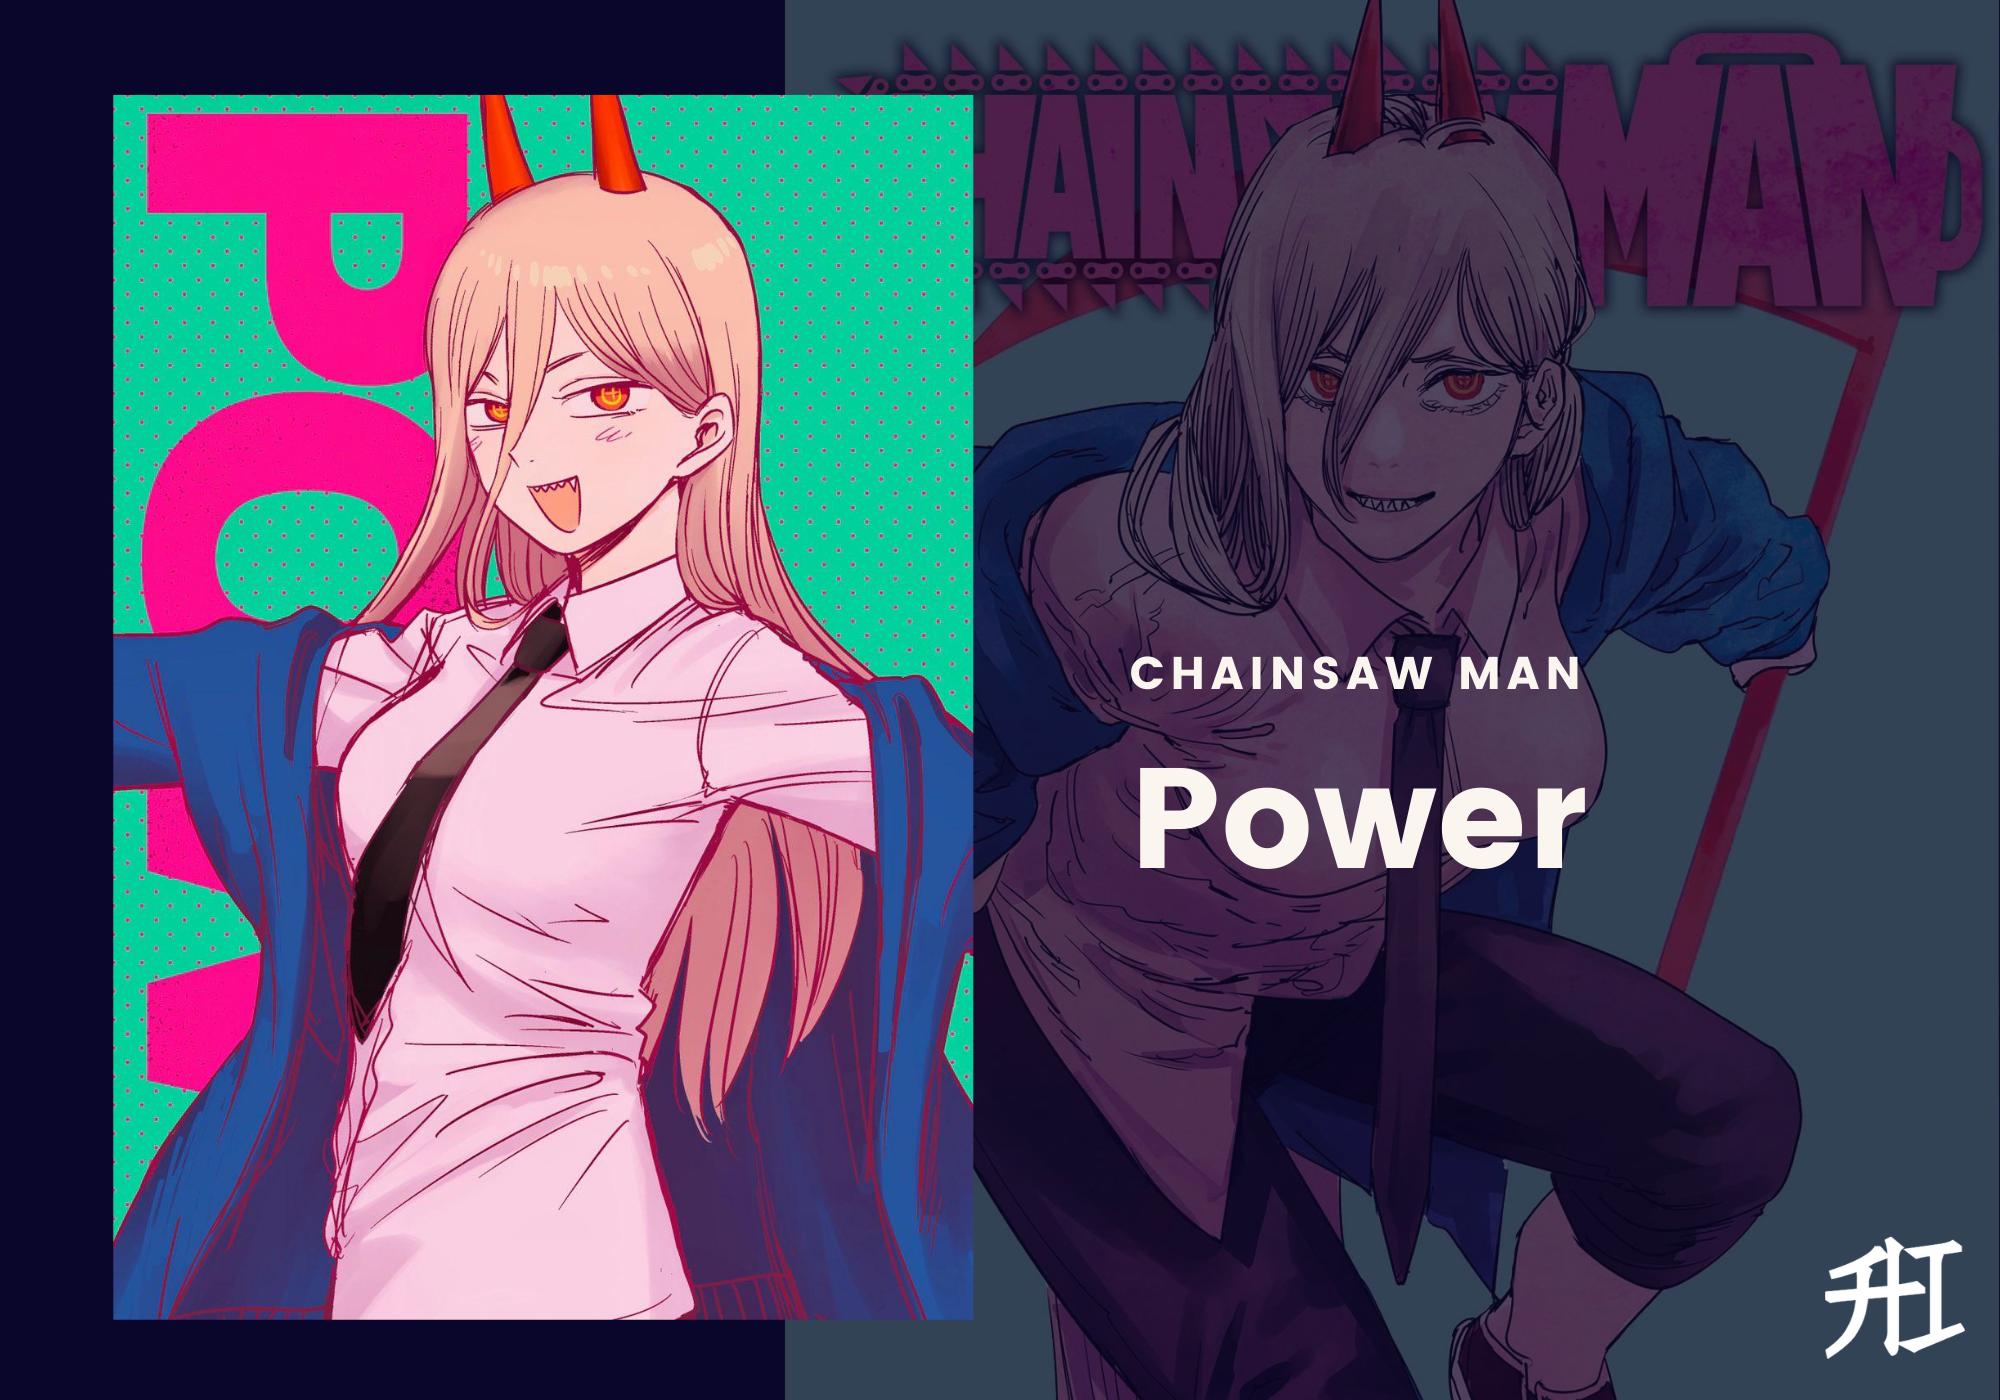 Power chainsaw man